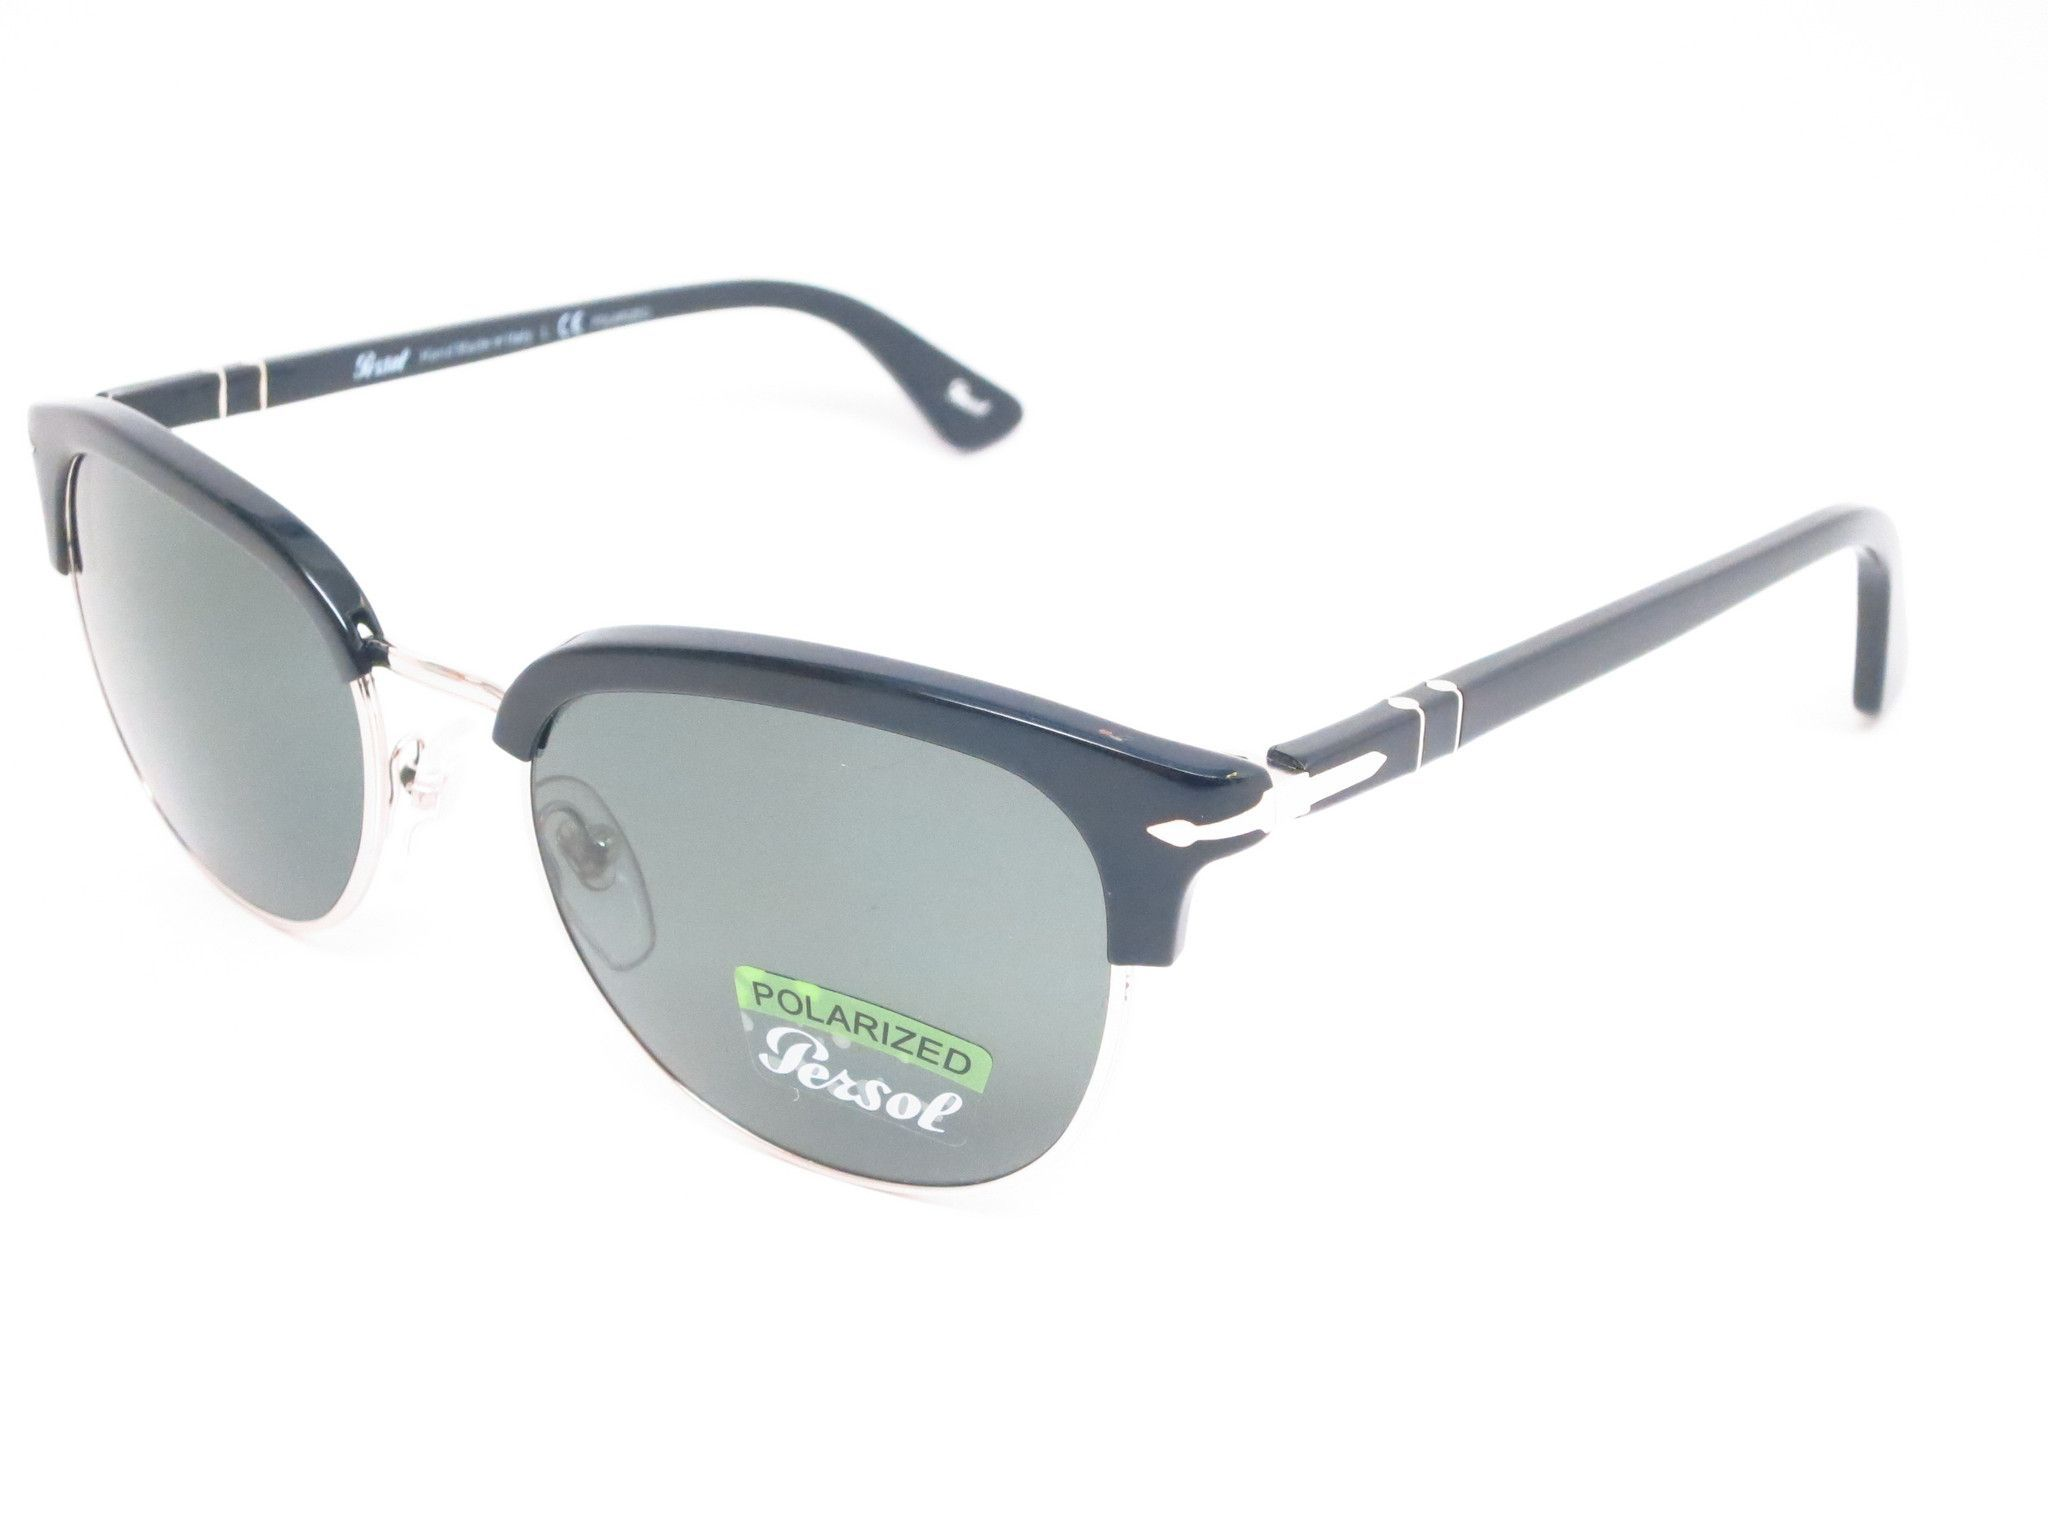 b0249a2417 Persol PO 9714-S 95 58 Shiny Black Polarized Folding Sunglasses